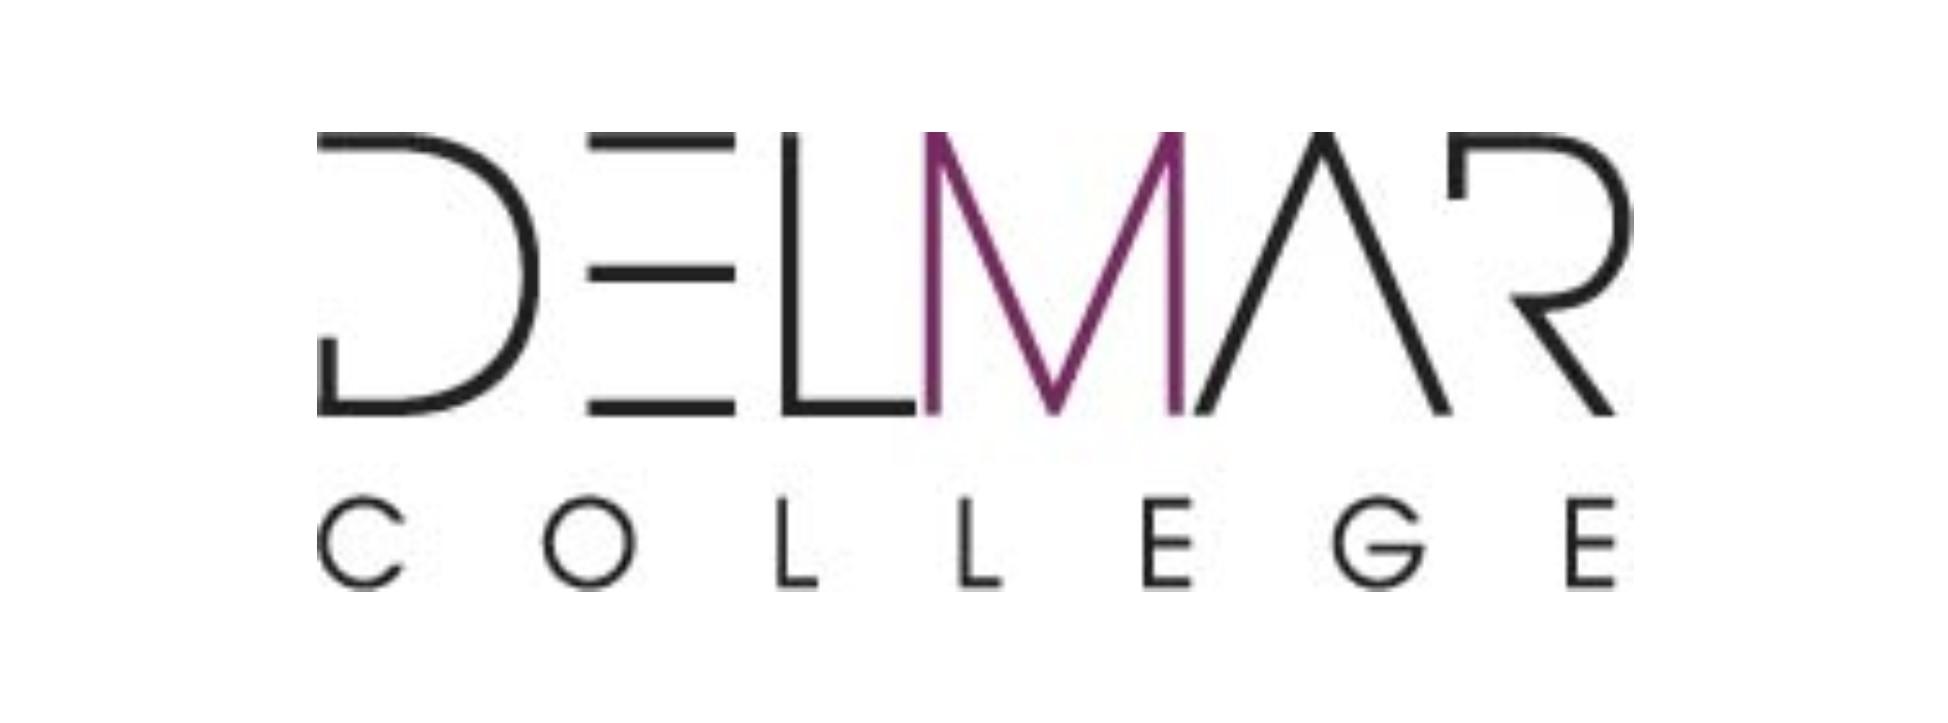 SS-Delmar